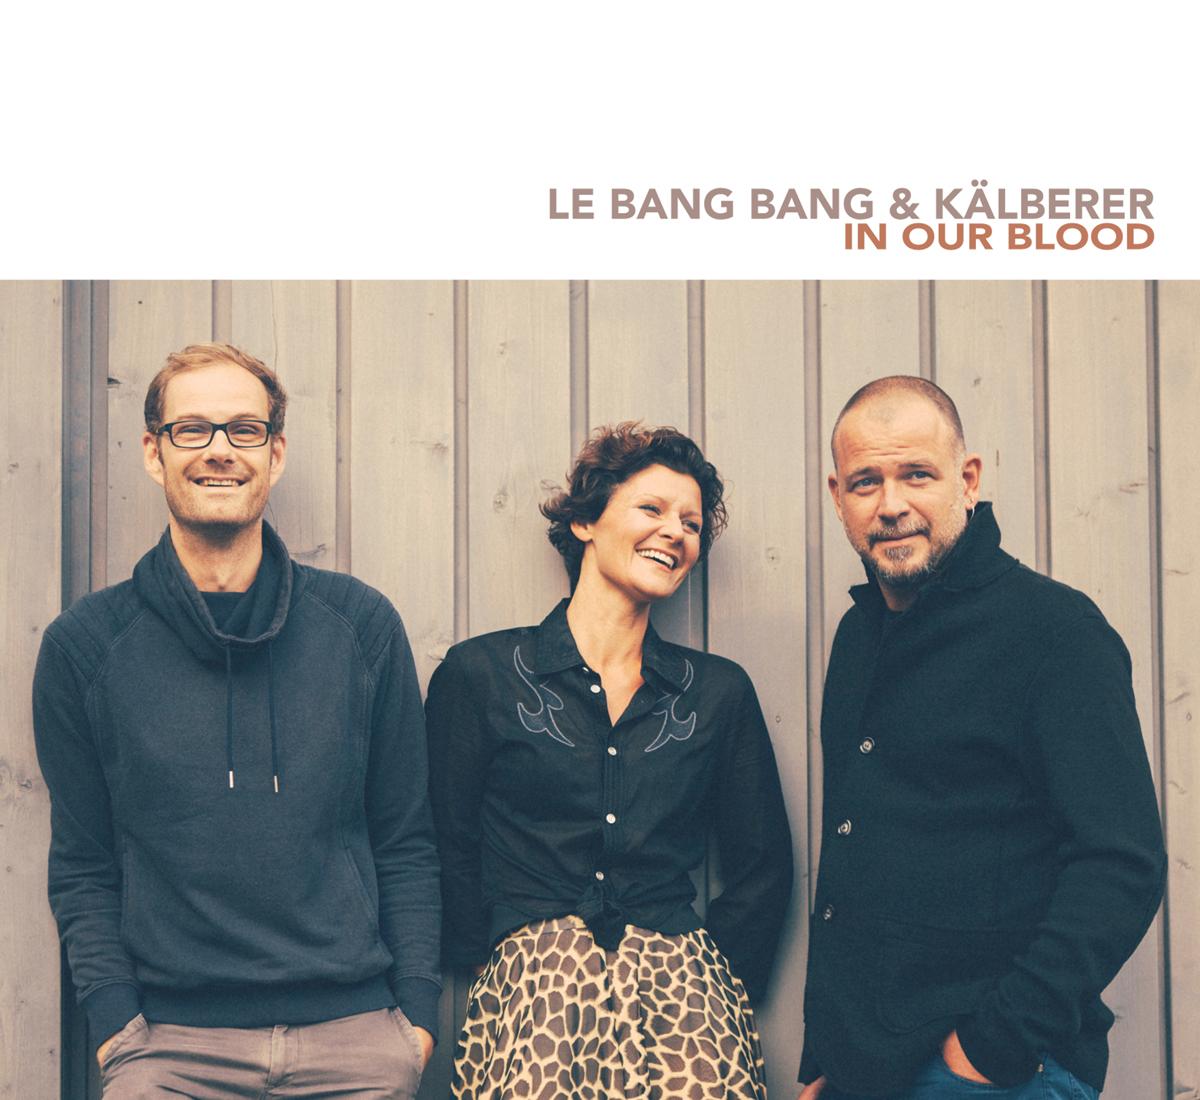 Le Bang Bang & Martin Kälberer - In Our Blood